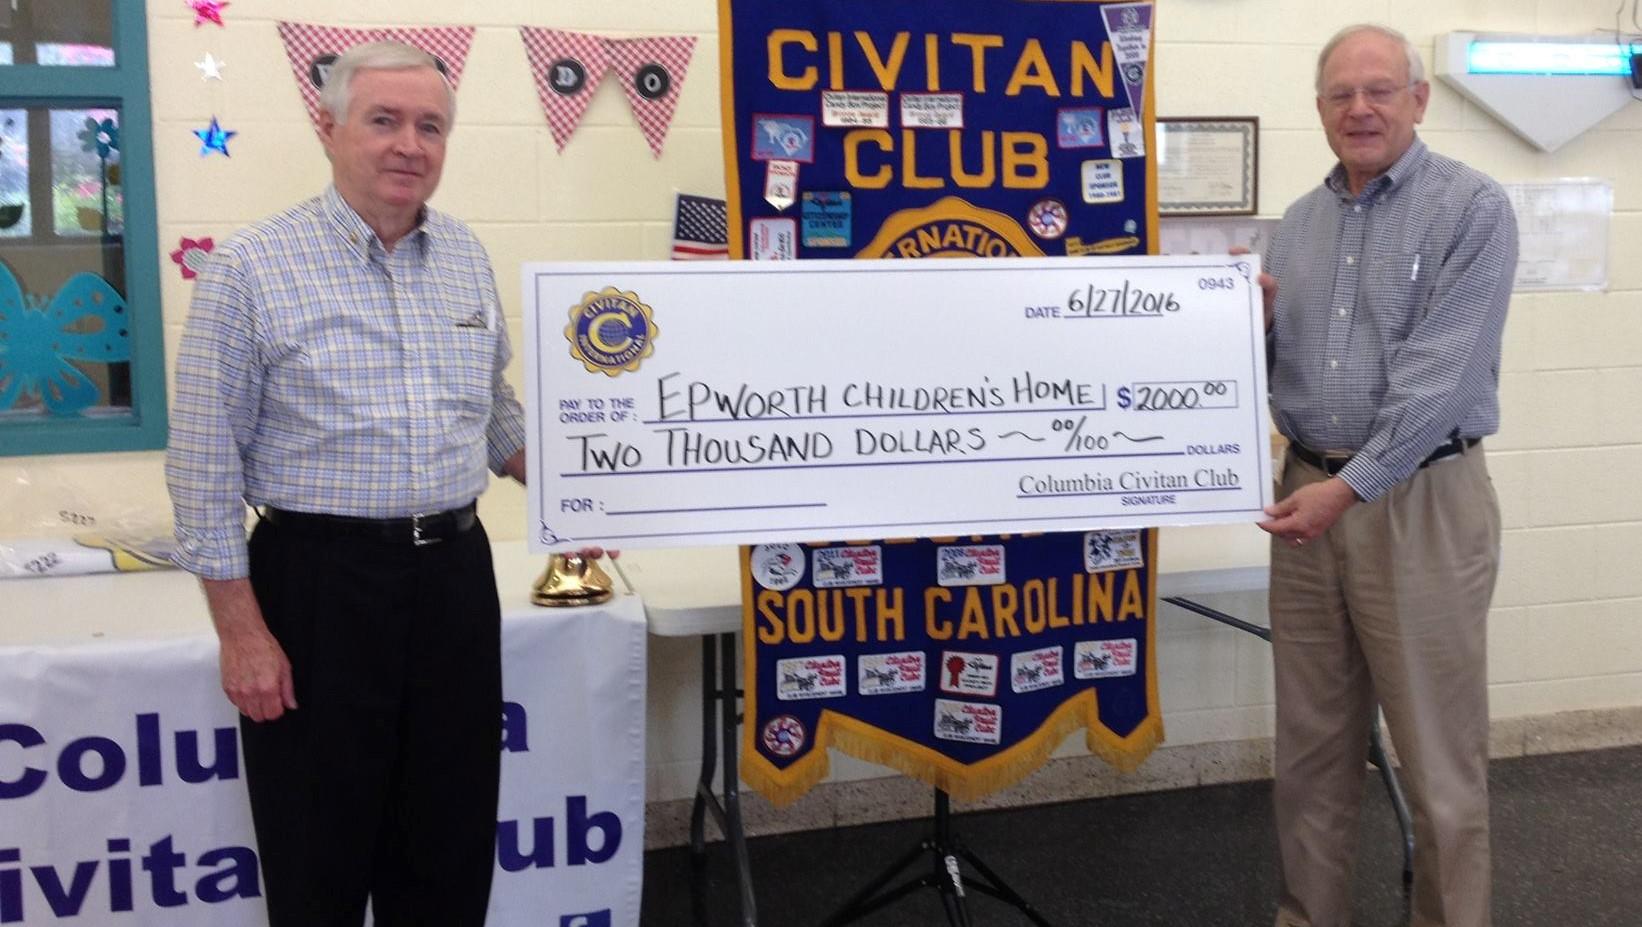 Columbia Civitans support Epworth Childrens Home